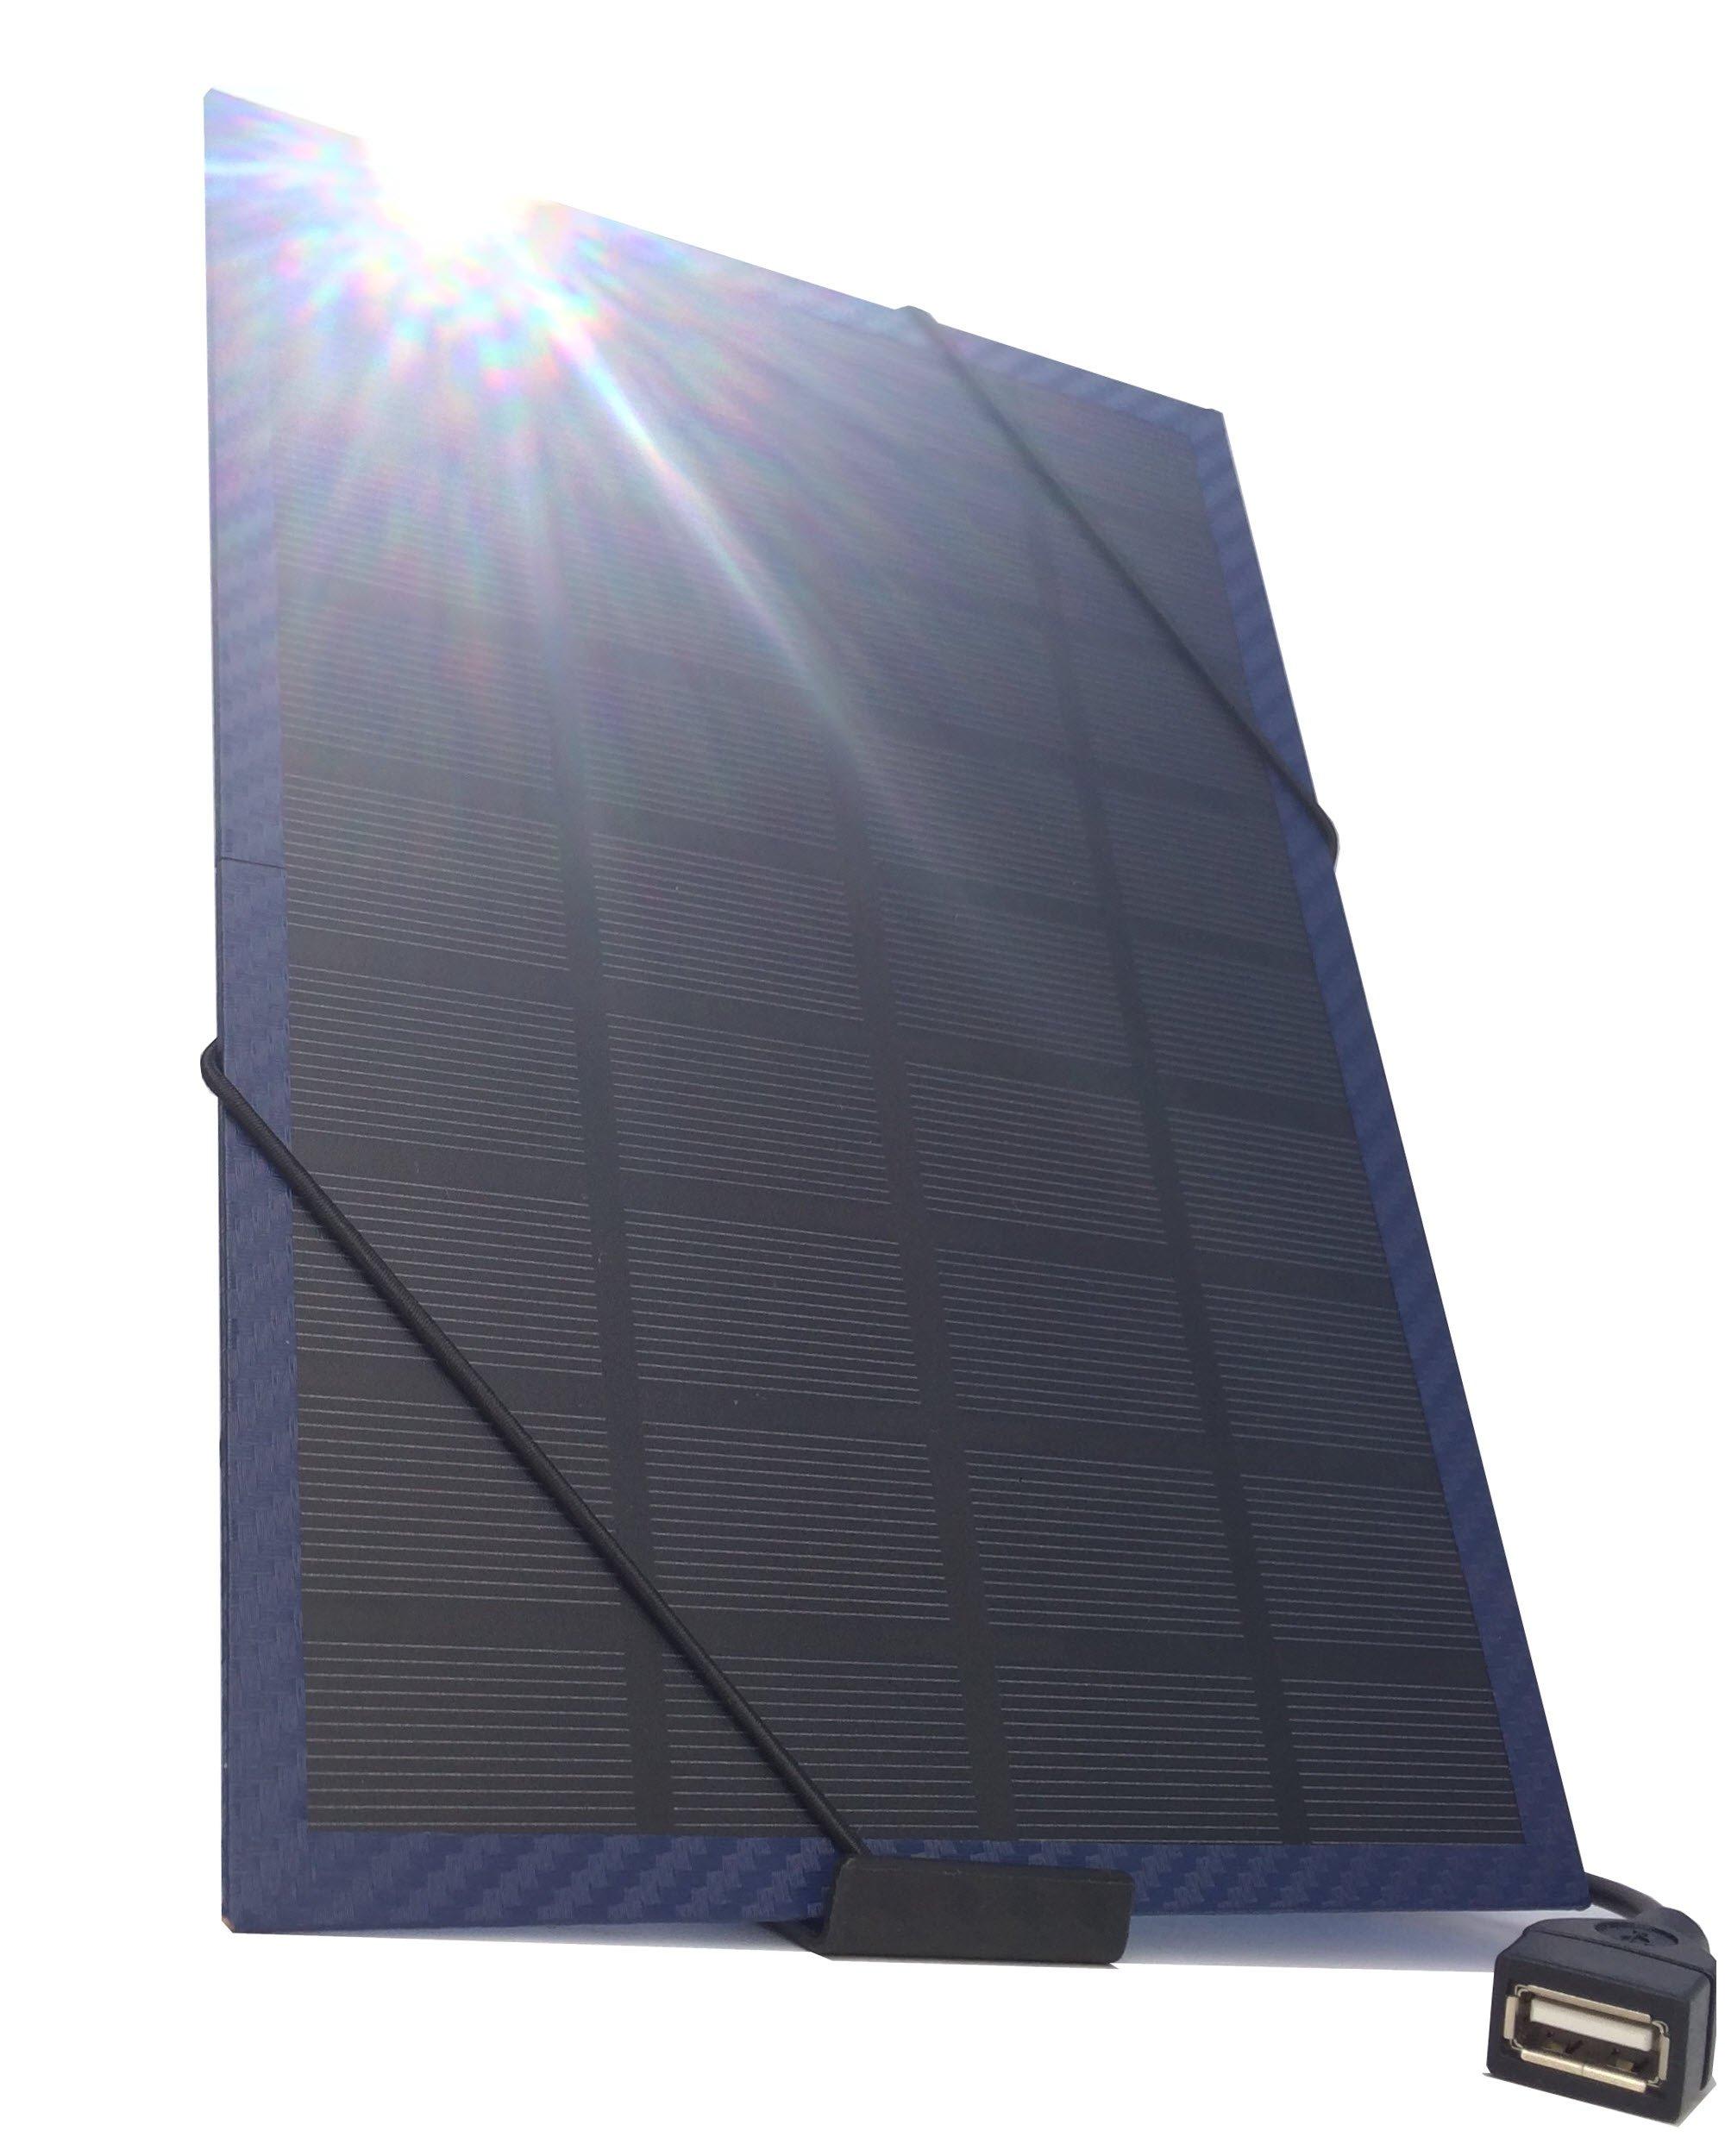 Cargador Solar Portatil de 5 Watts de Salida NEFF SOLAR Azul